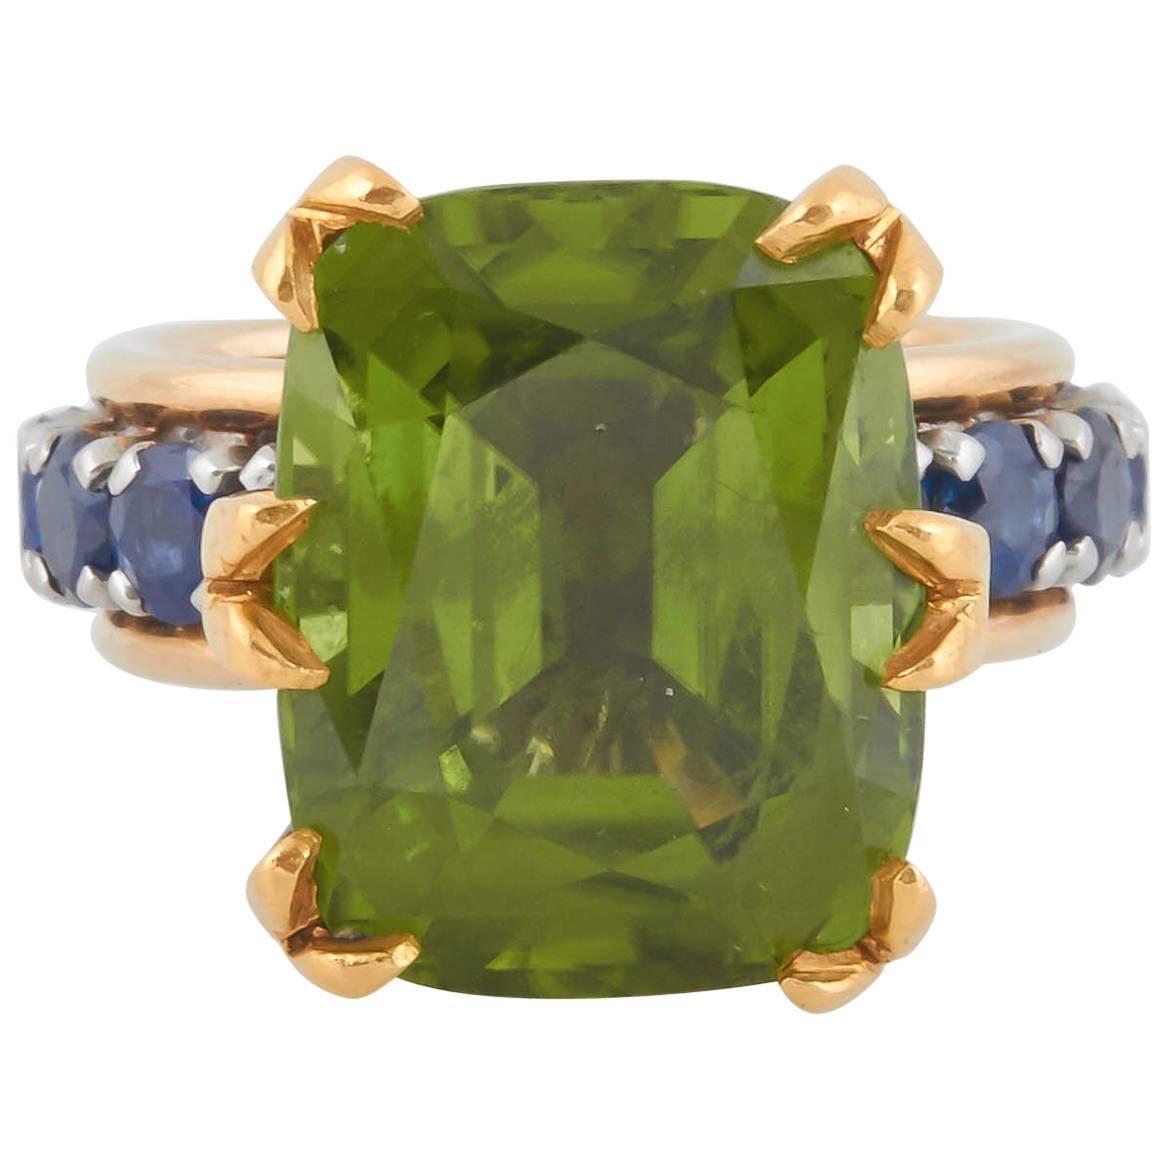 Tiffany & Co. Schlumberger Peridot Ring